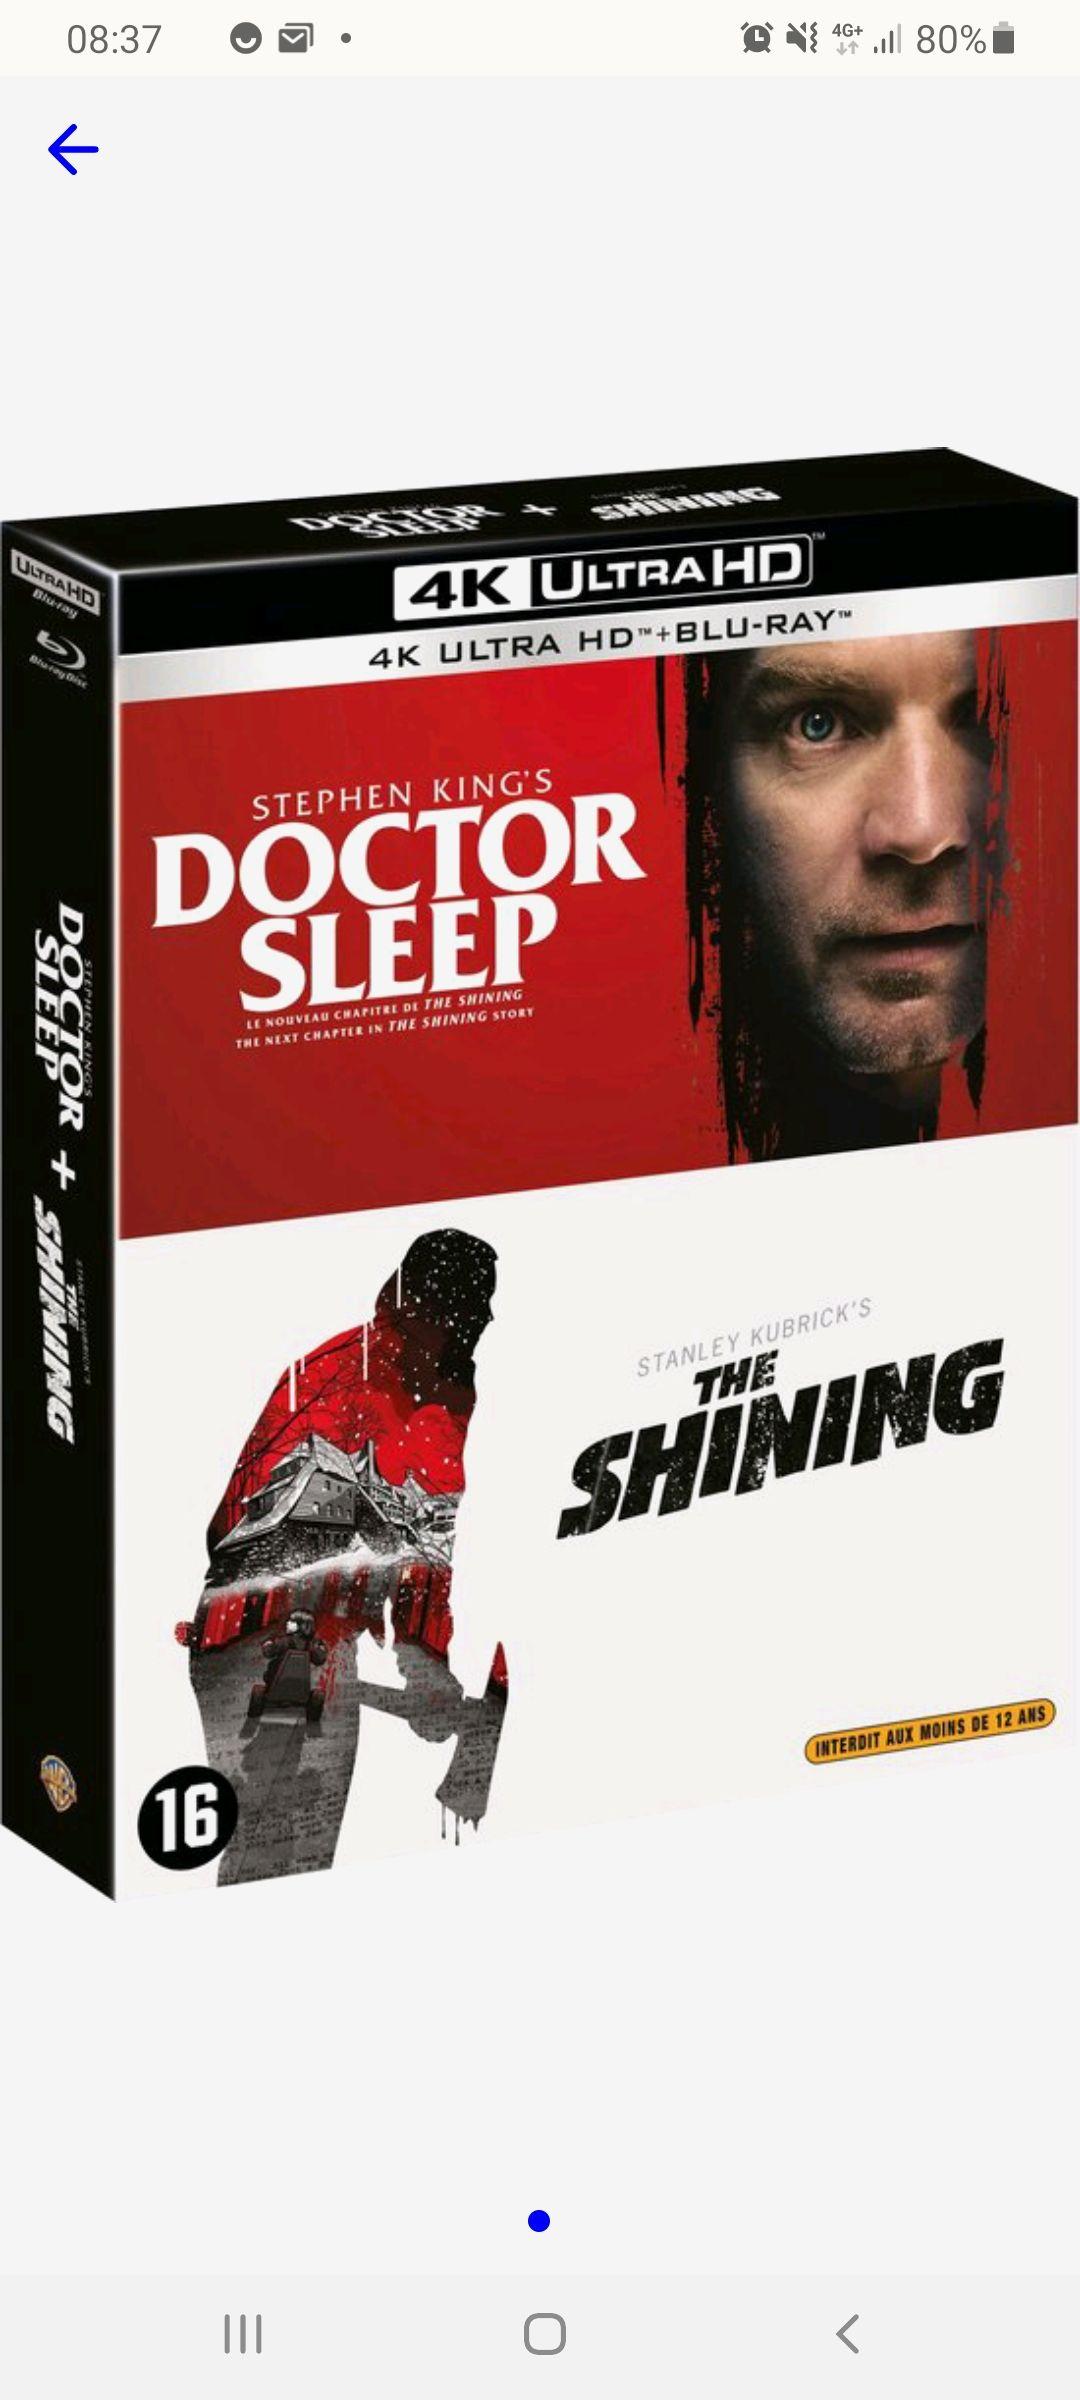 Doctor sleep + The Shining 4k Blu ray